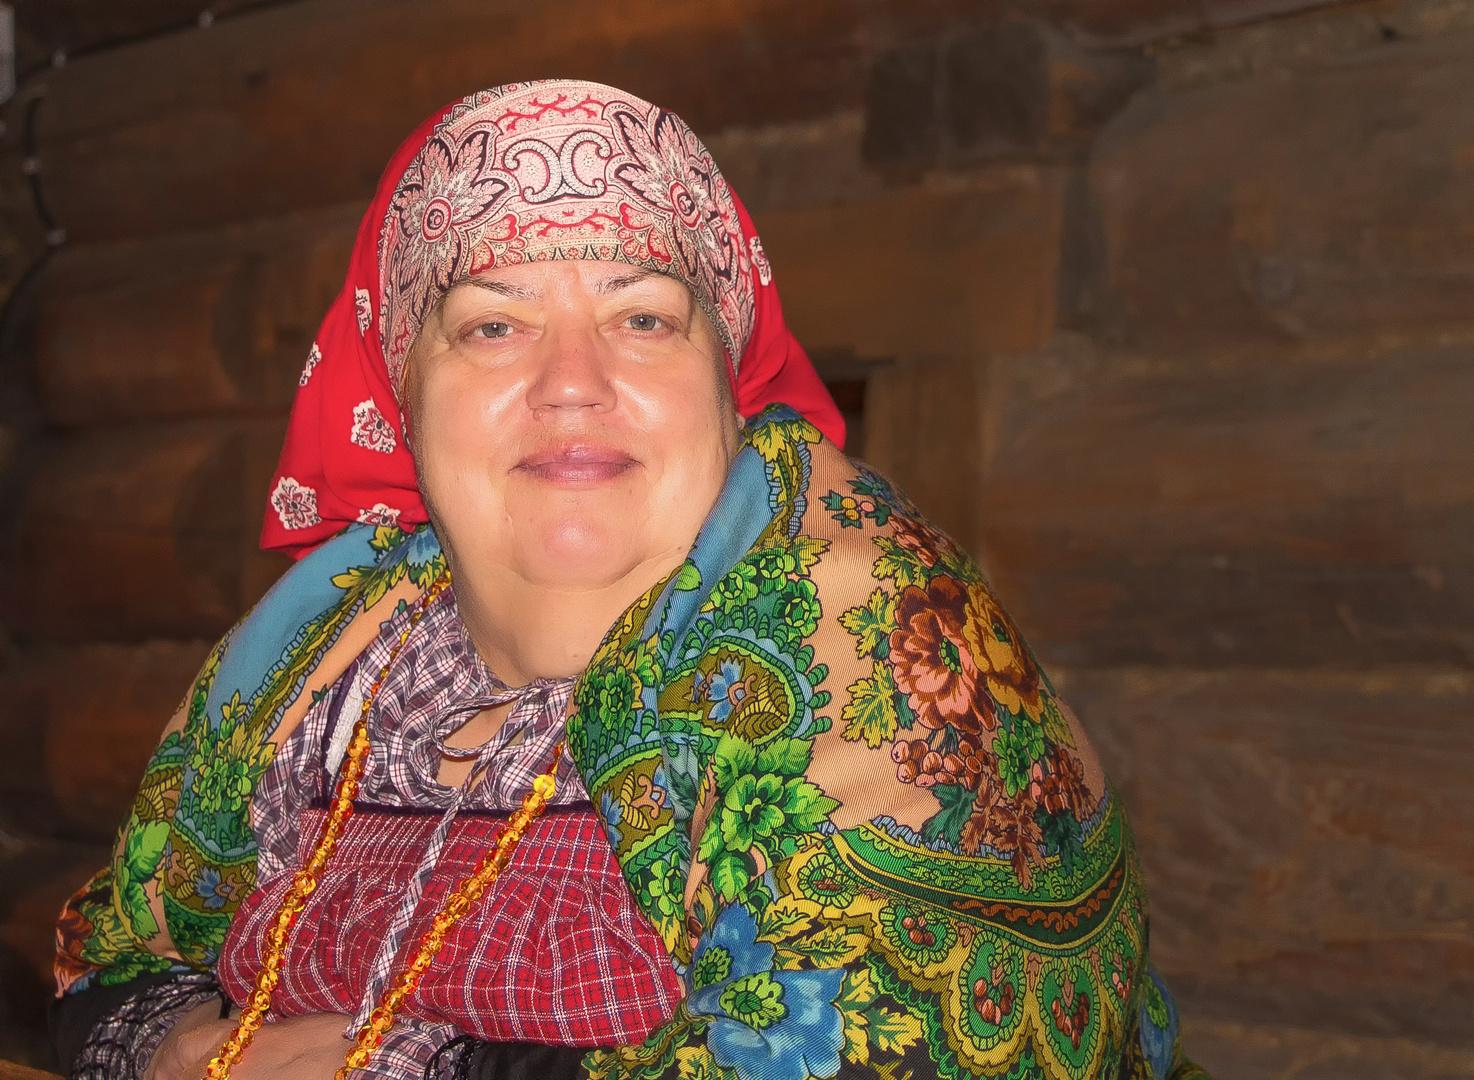 Frau aus Nordrussland